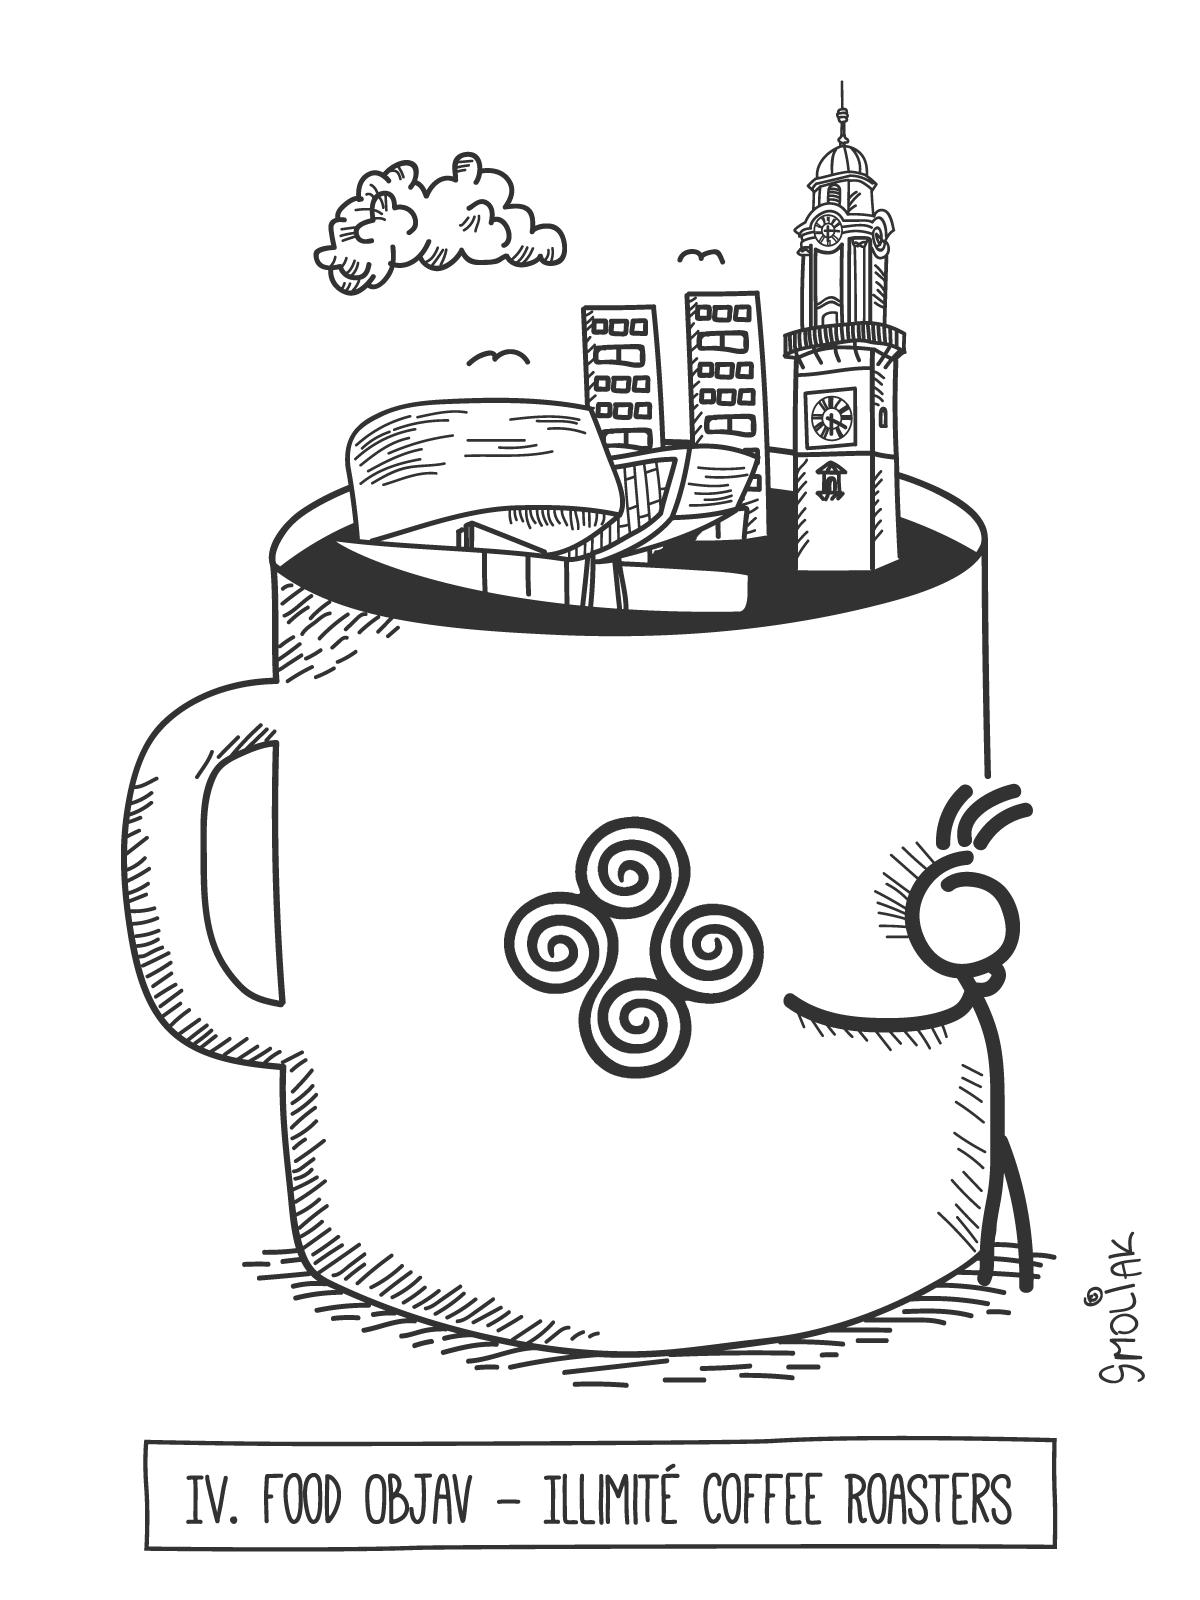 Illimité coffee roaster - Káva